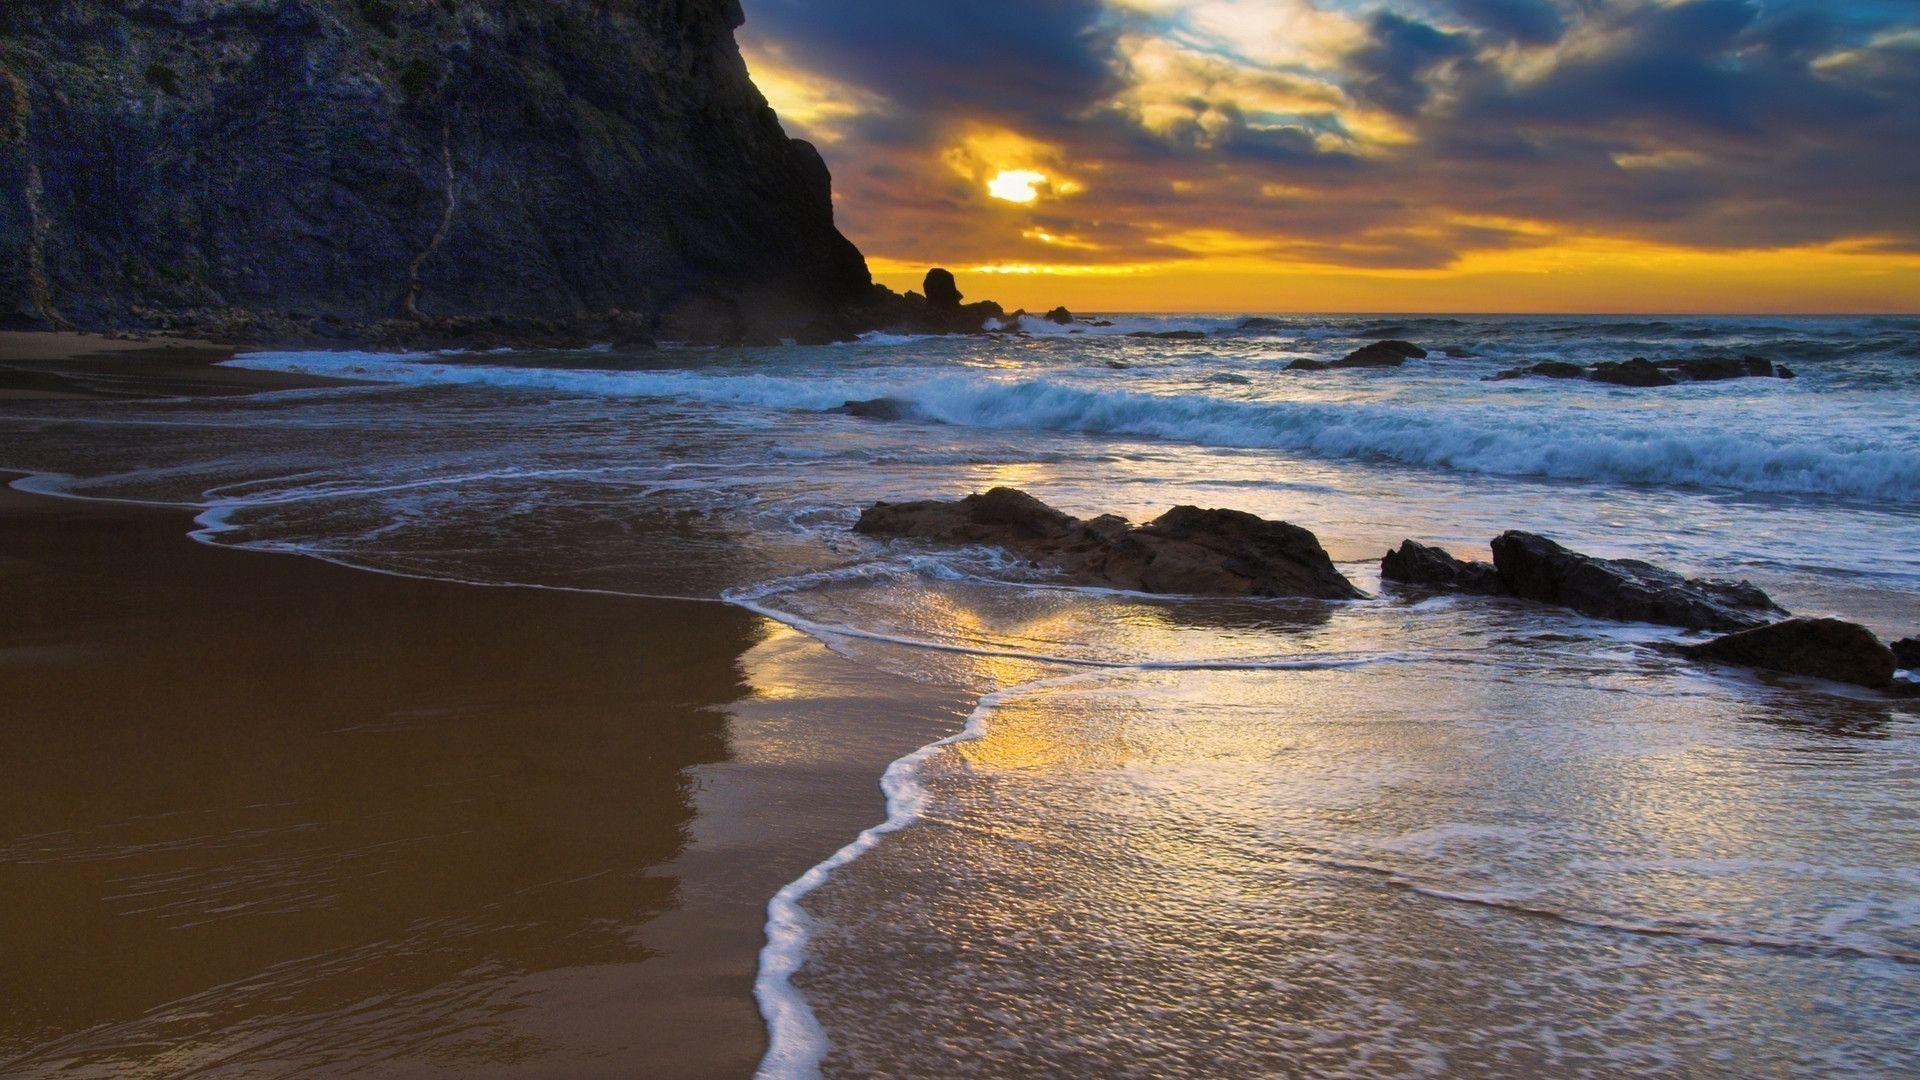 Widescreen Seascape Wallpaper